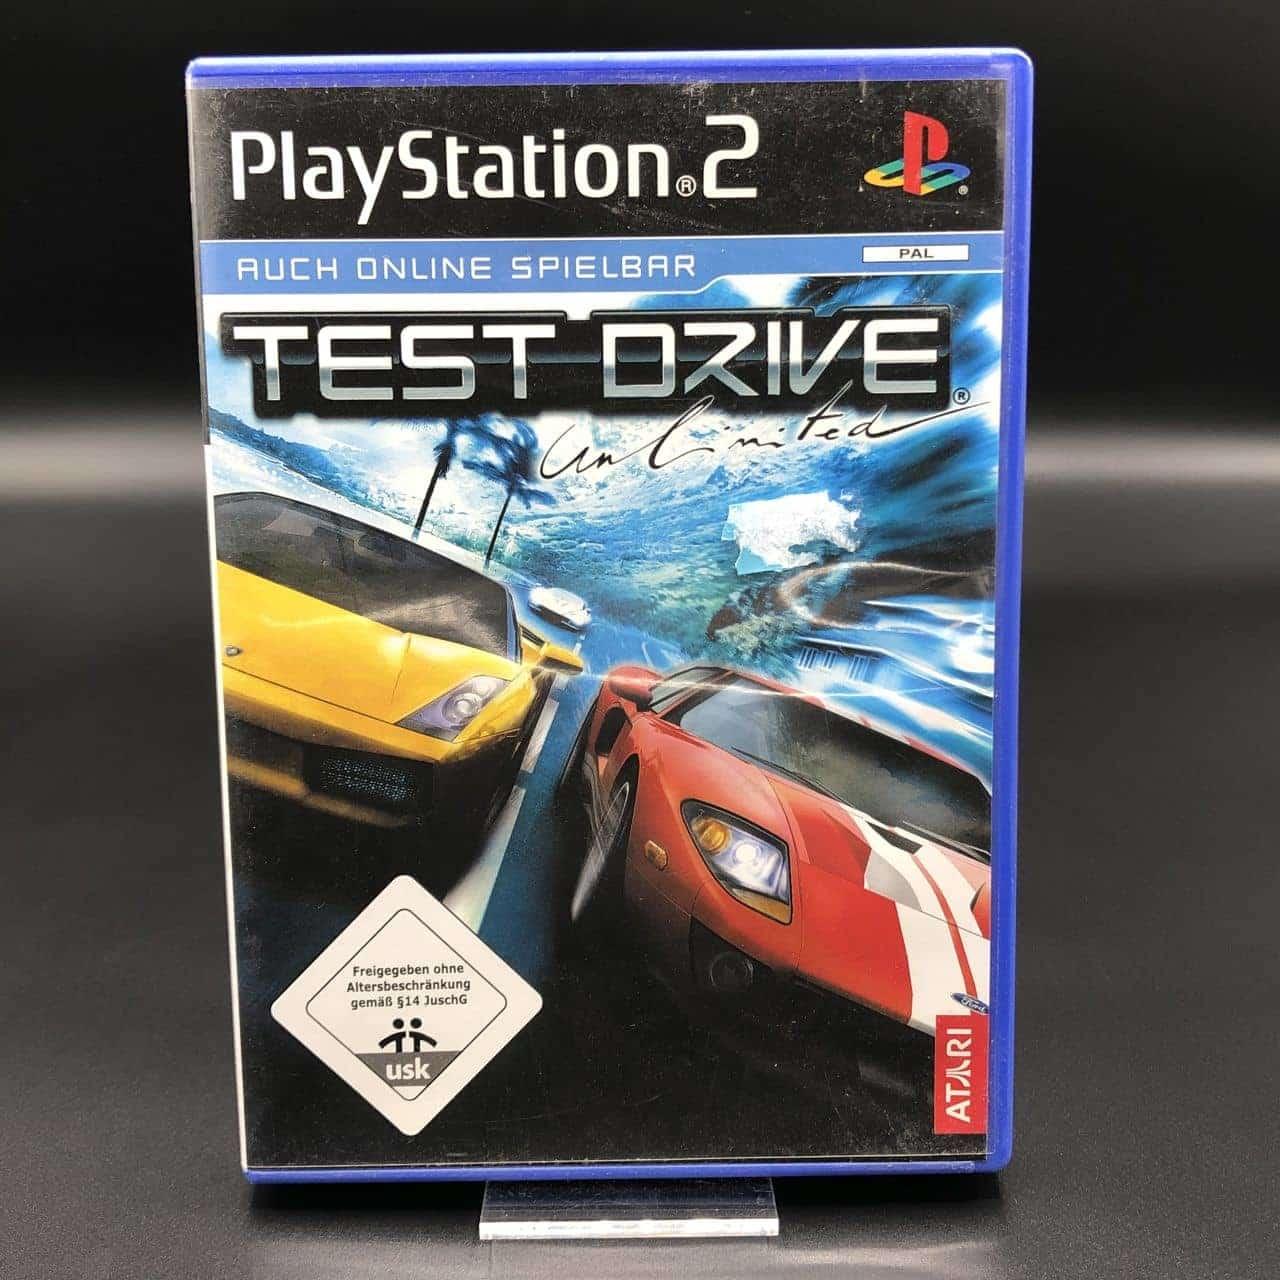 PS2 Test Drive Unlimited (Komplett) (Gut) Sony PlayStation 2